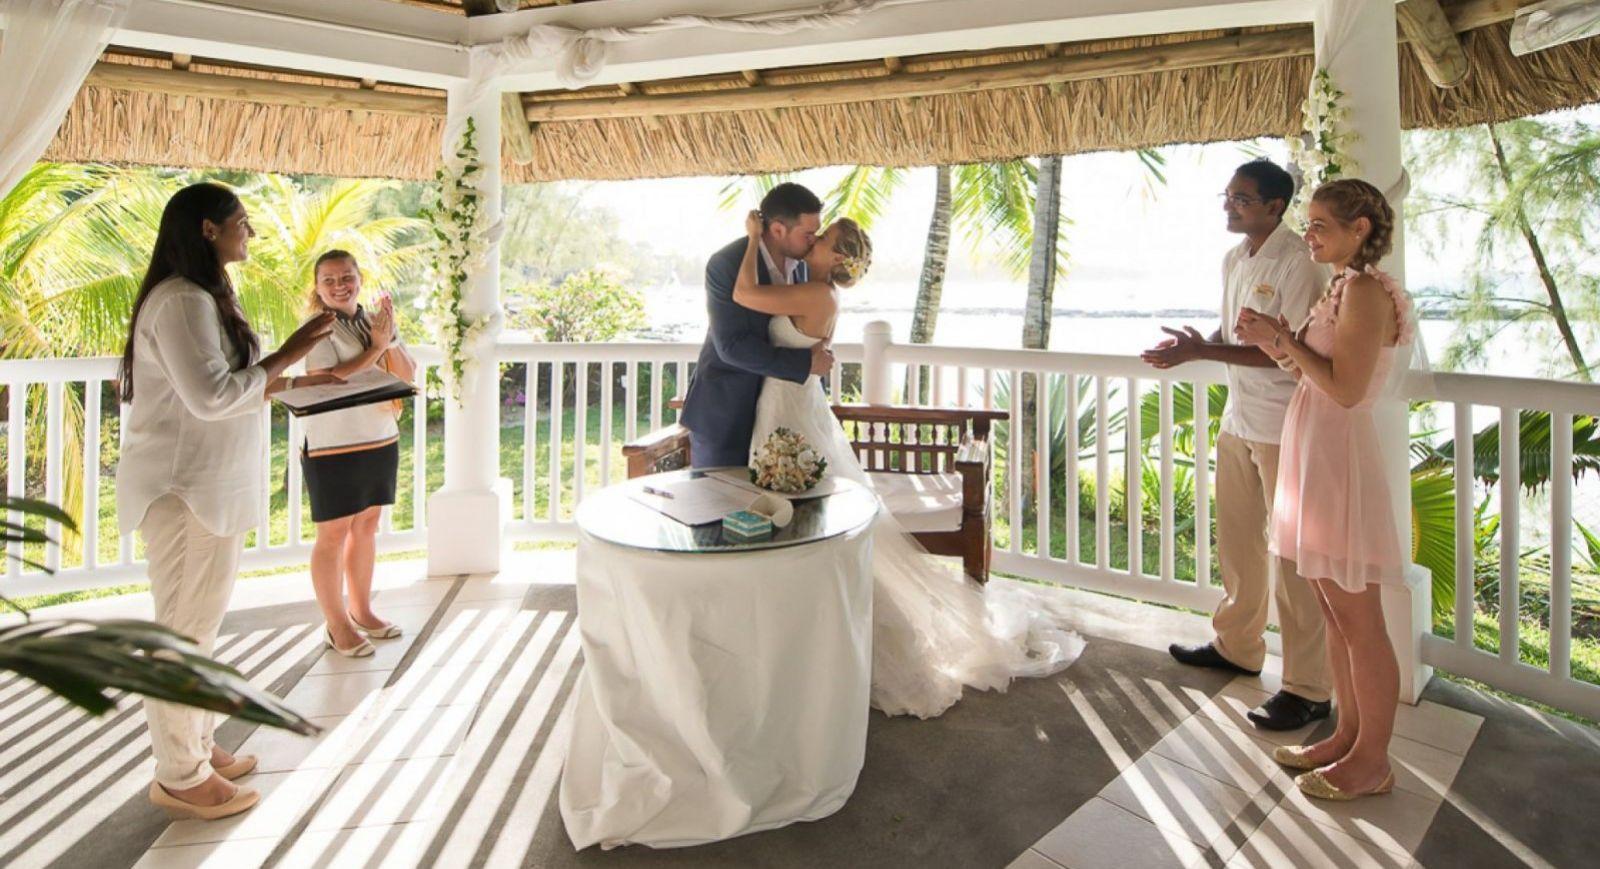 Právoplatná svadba